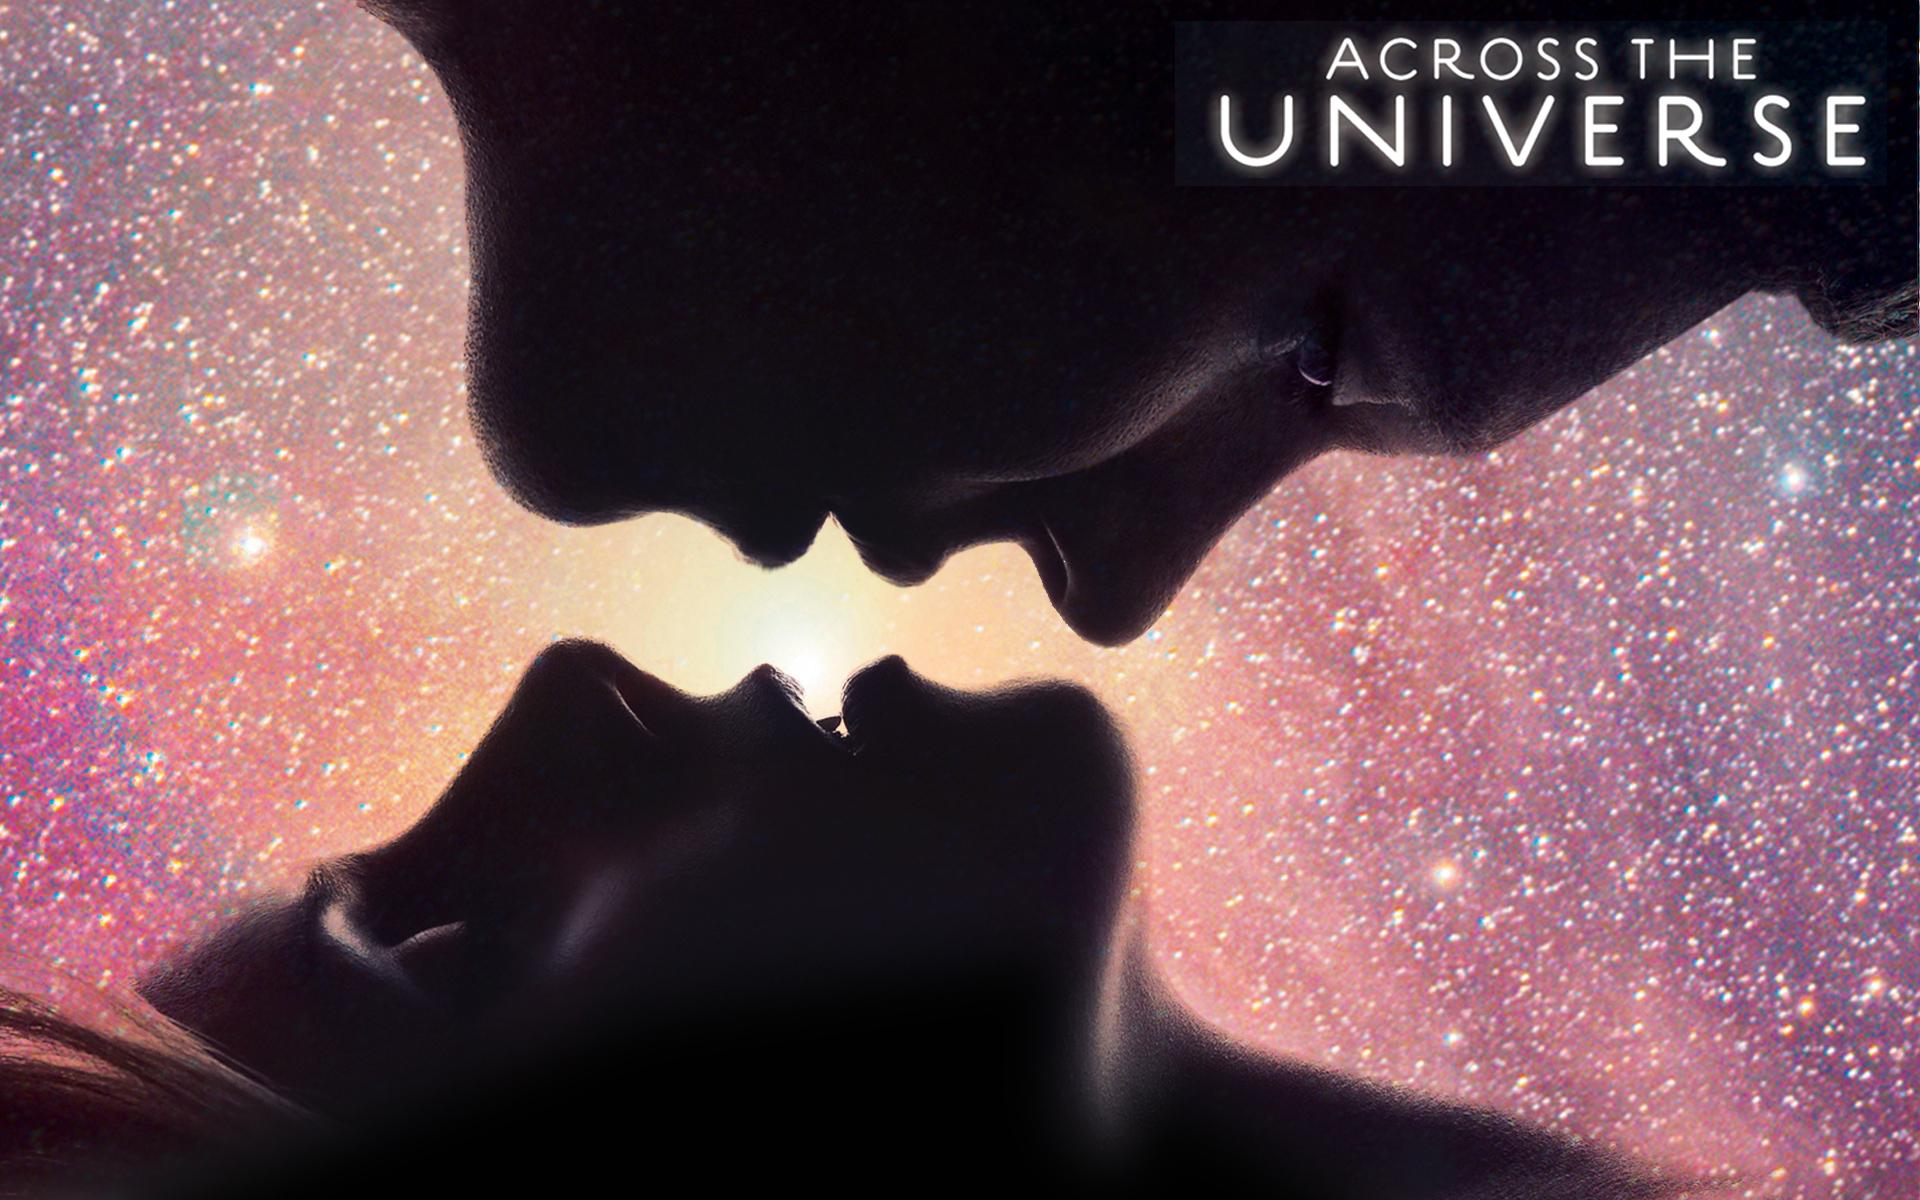 Revis universe pdf the beth across